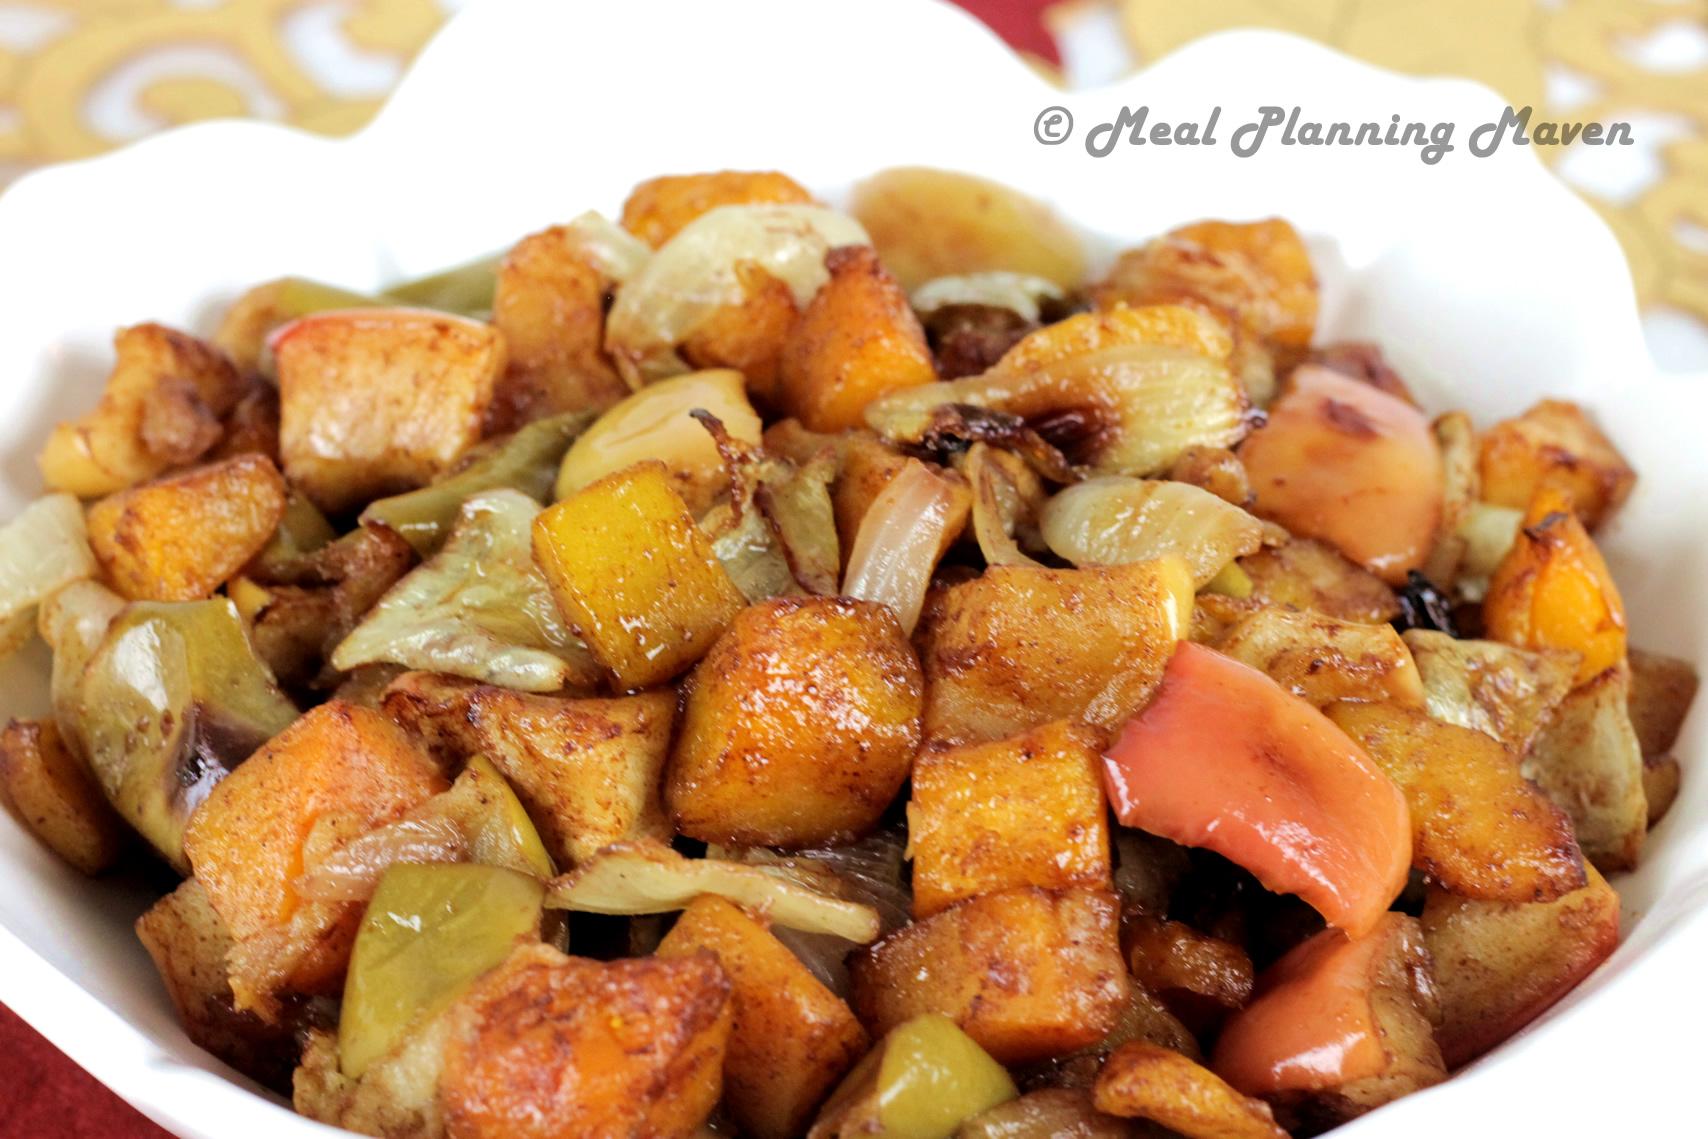 Roasted Apples, Butternuts 'n Onions